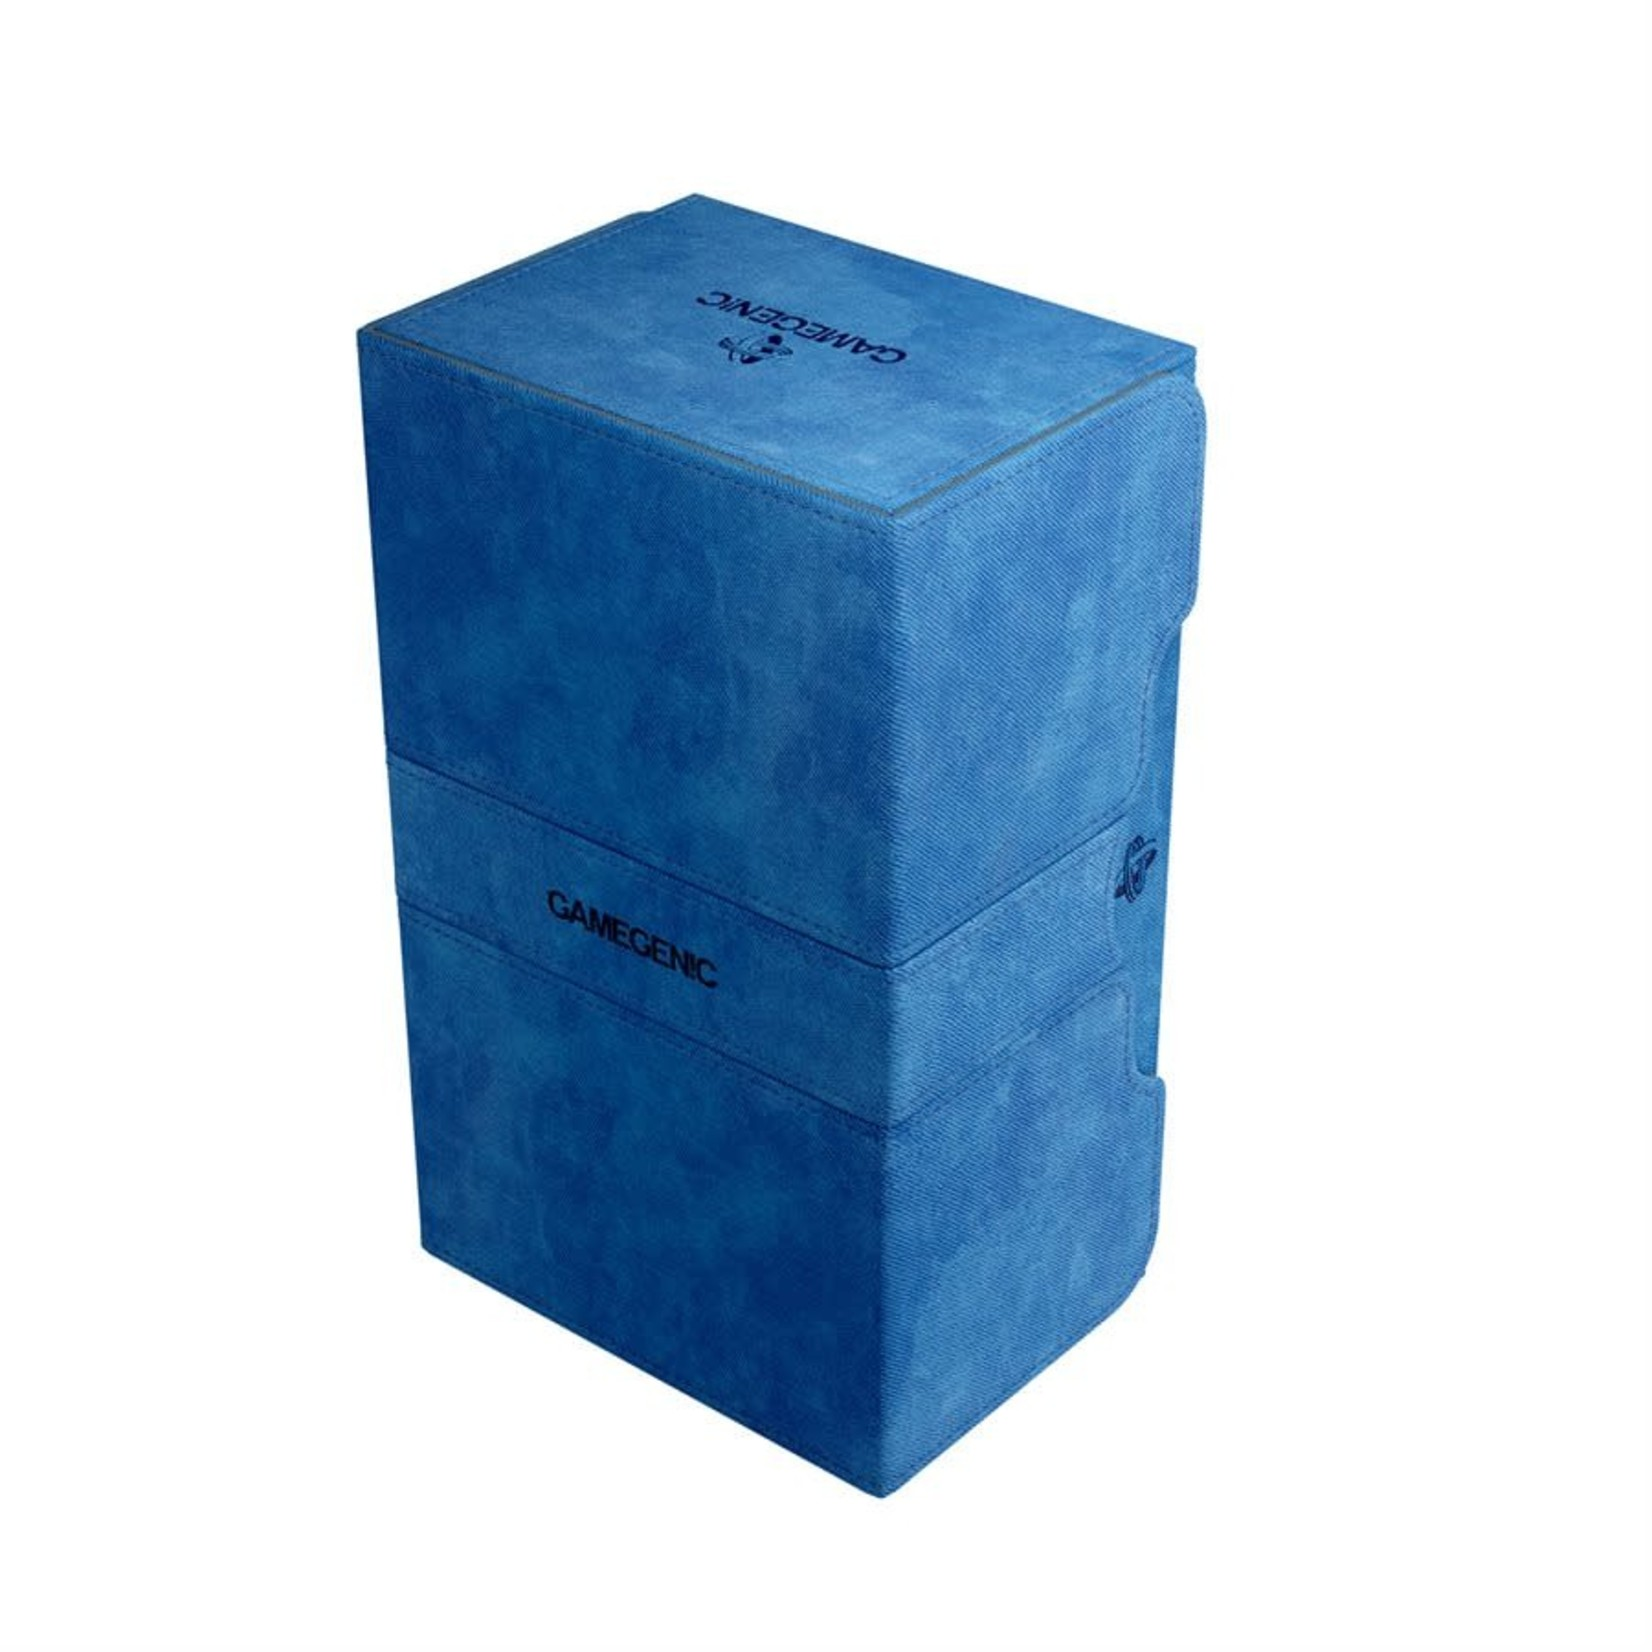 Gamegenic Deck Box Stronghold Convertible Bleu